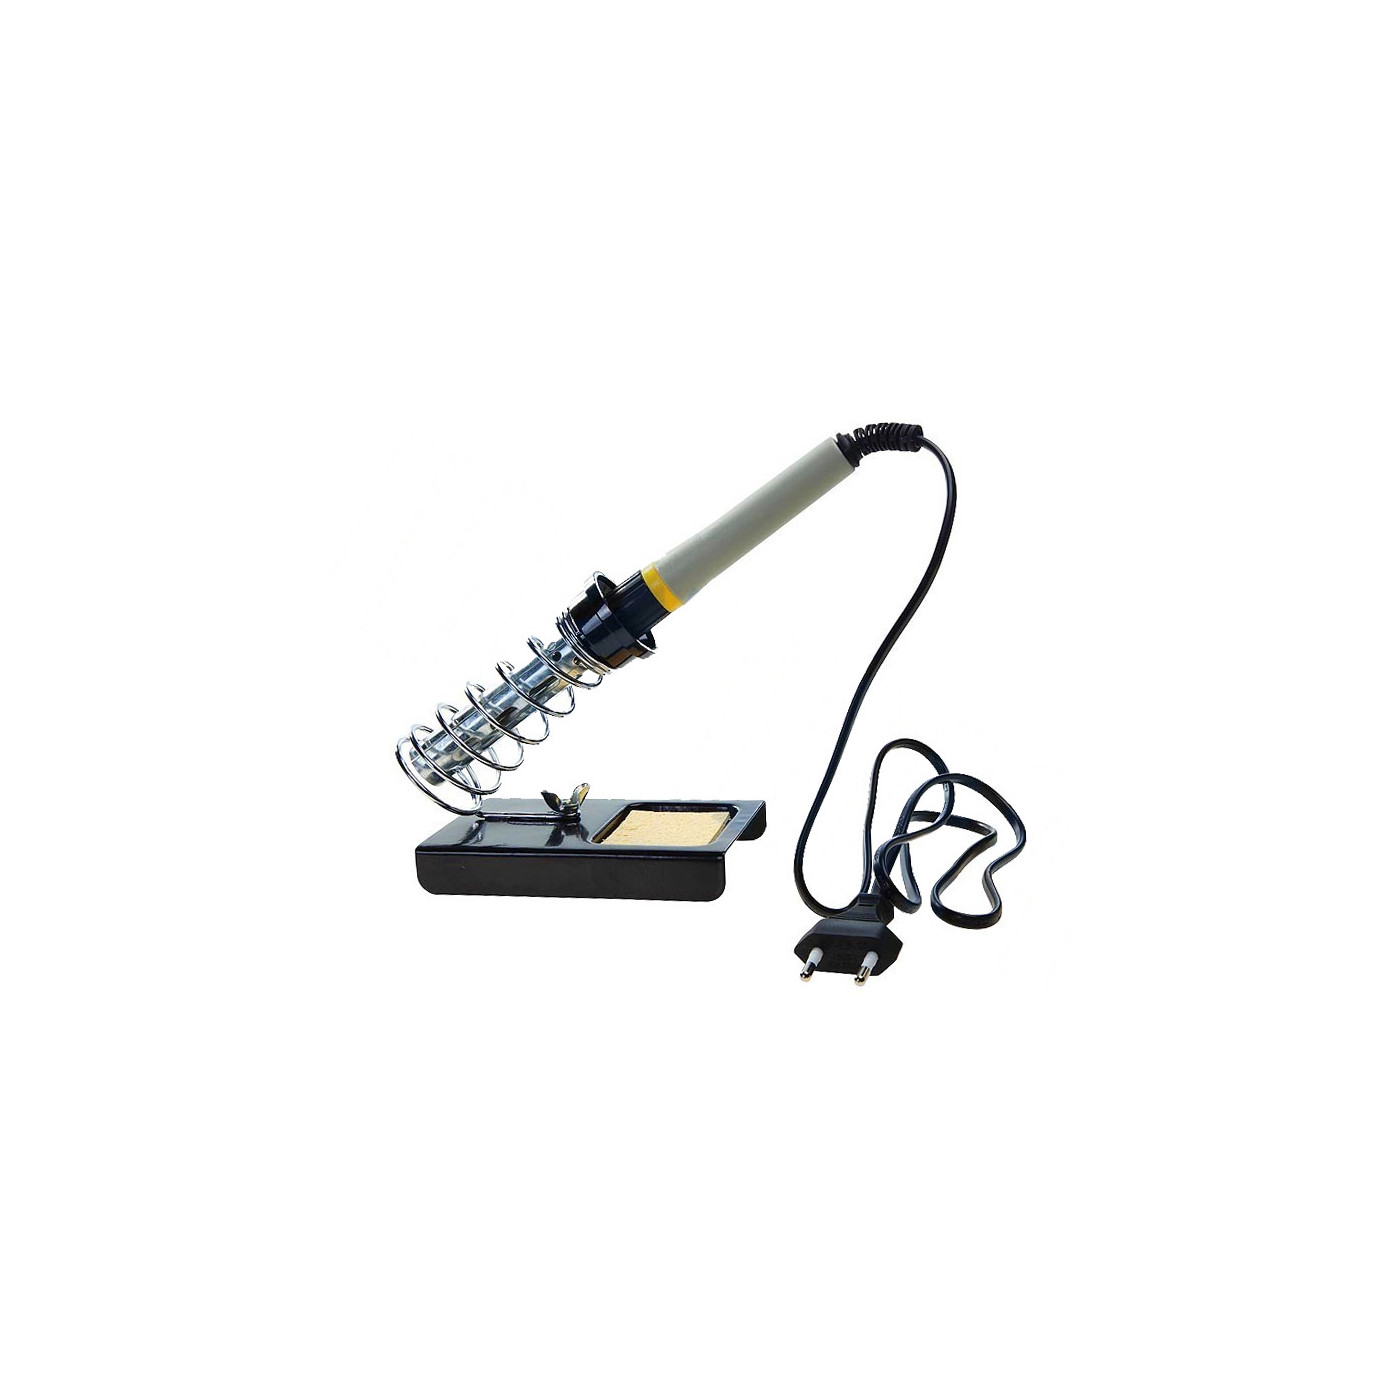 Eenvoudige soldeerbout (30 Watt en 1,2 meter kabel)